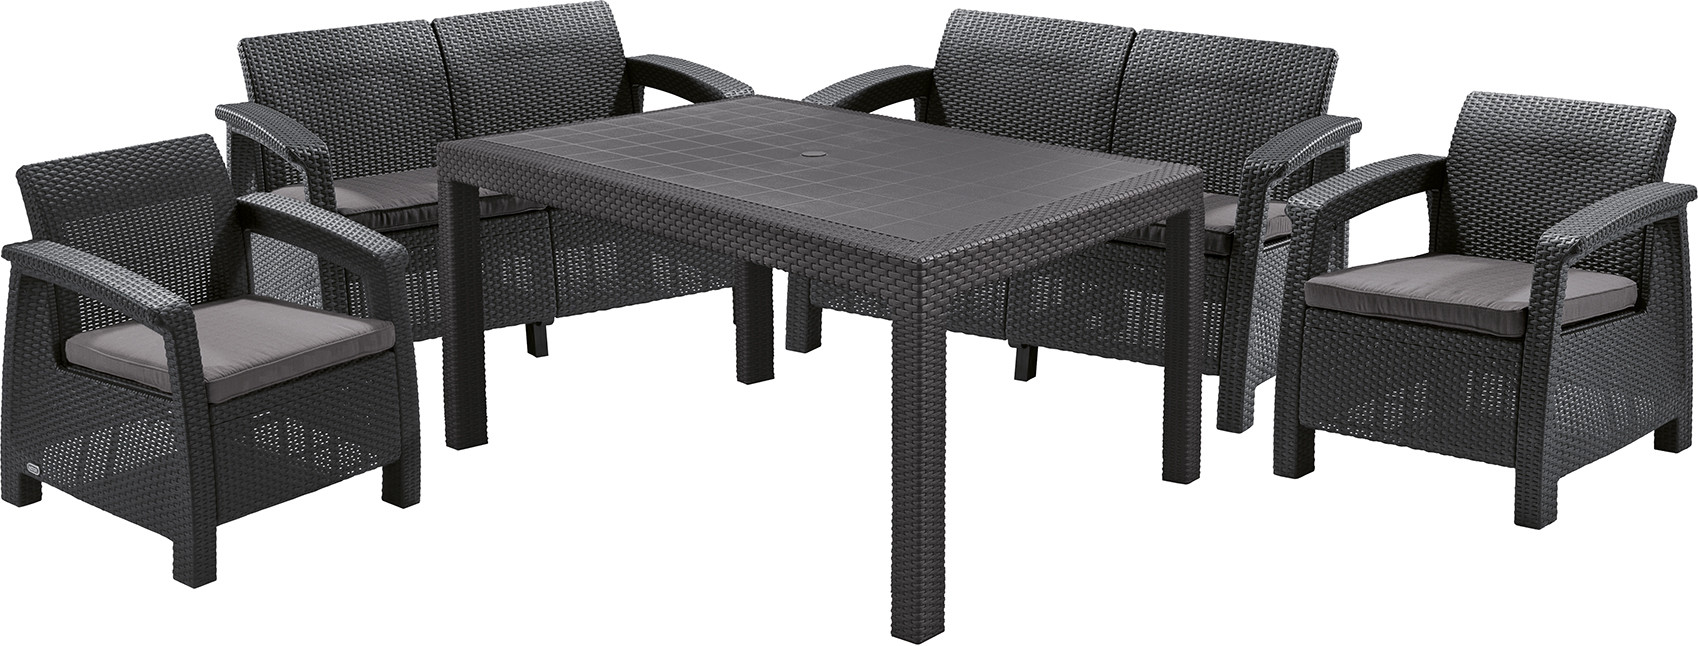 Комплект мебели Allibert Corfu Fiesta Set Graphite Grey